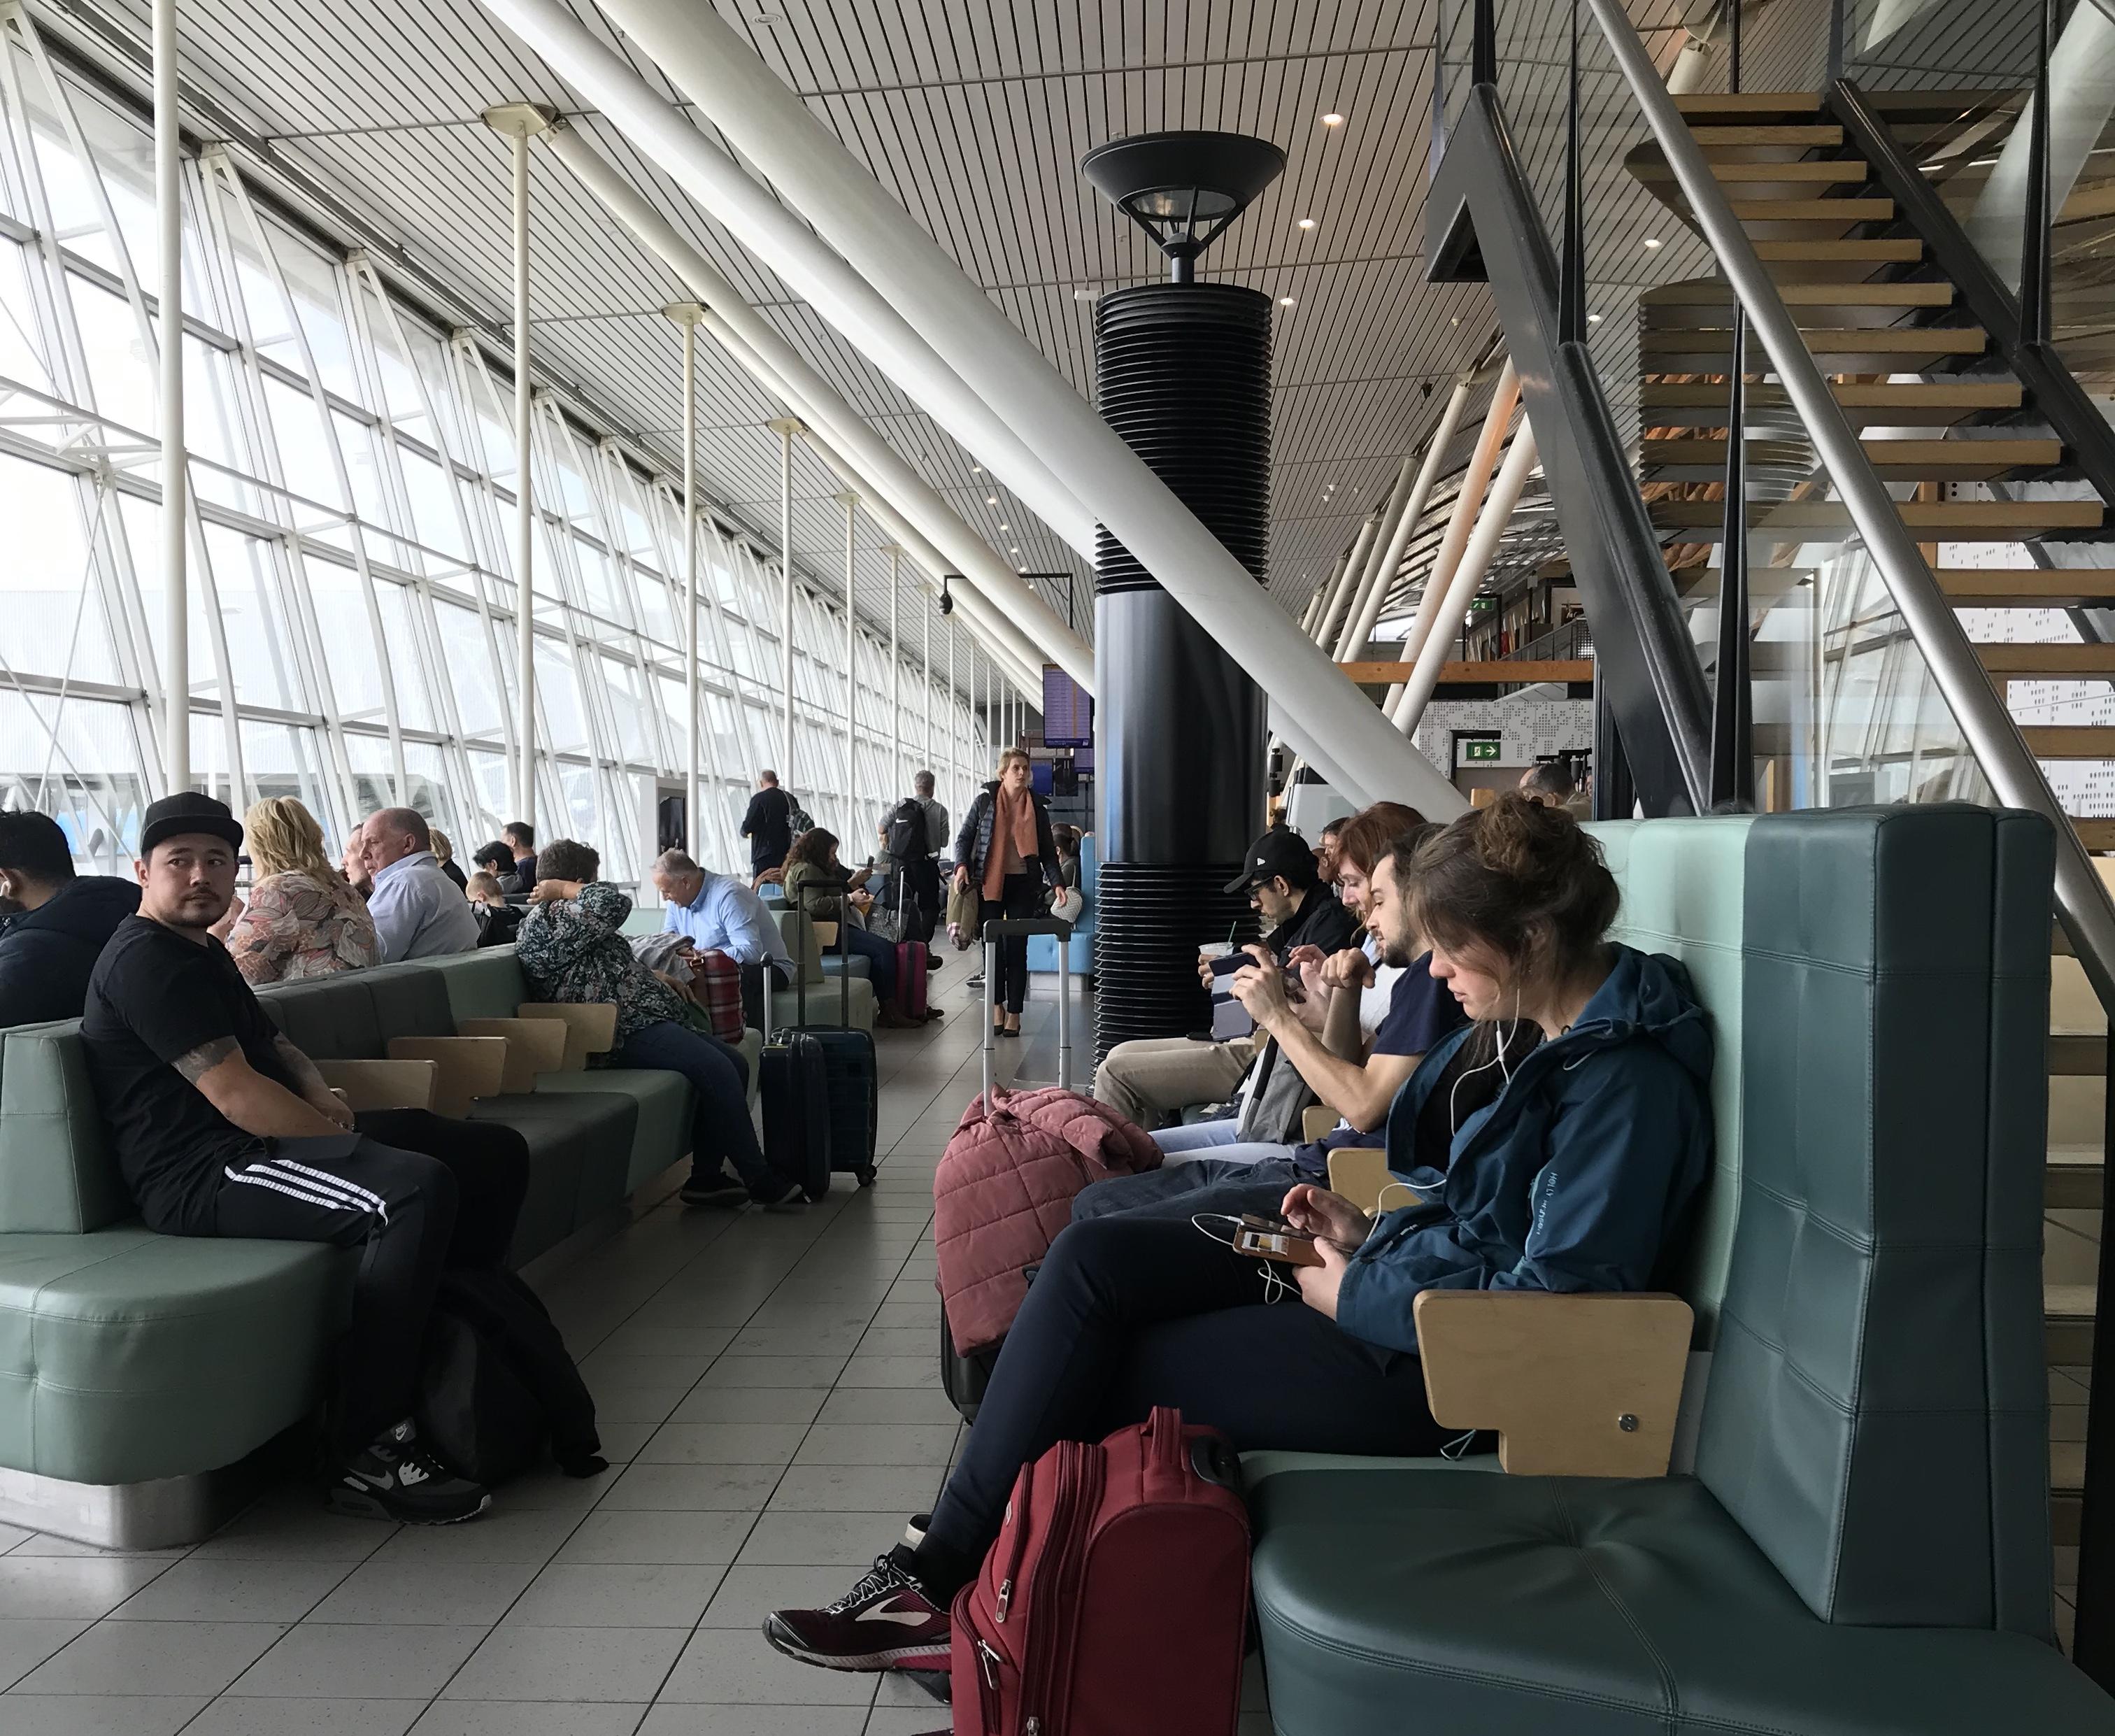 فرودگاه شيفول- ٩ سپتامبر ٢٠١٩